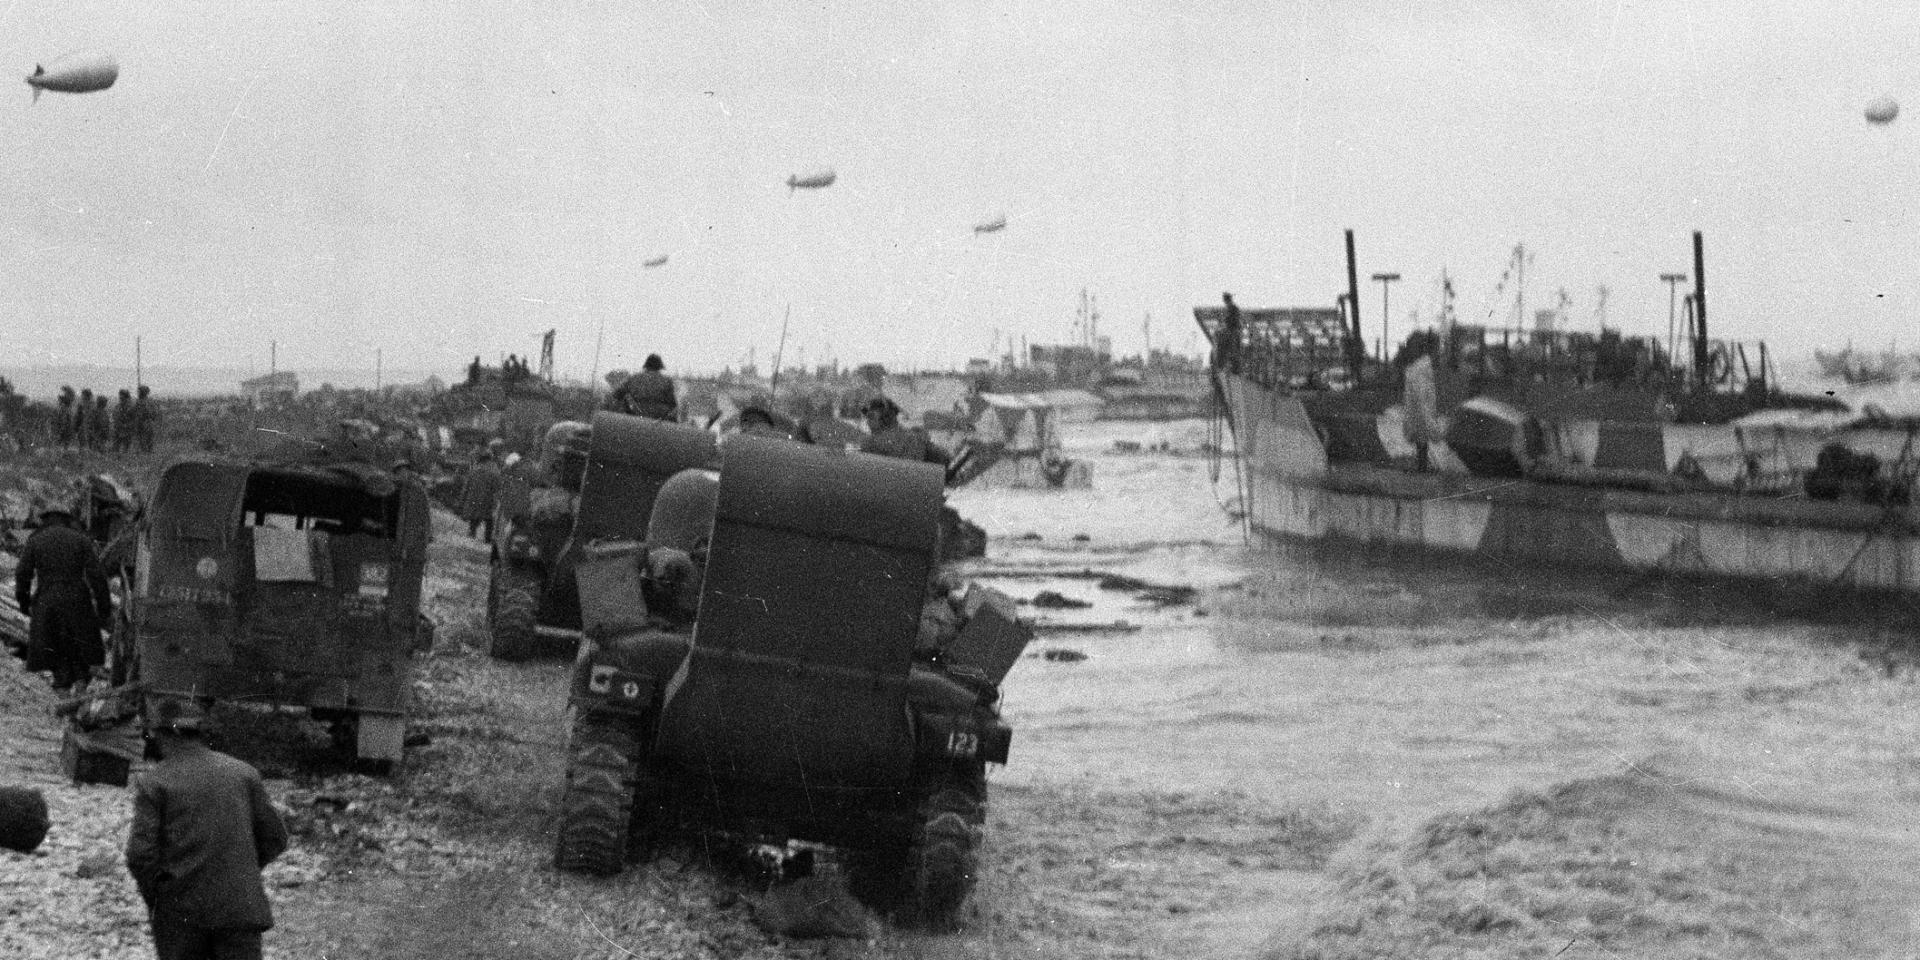 Landing tanks in Normandy, 1944